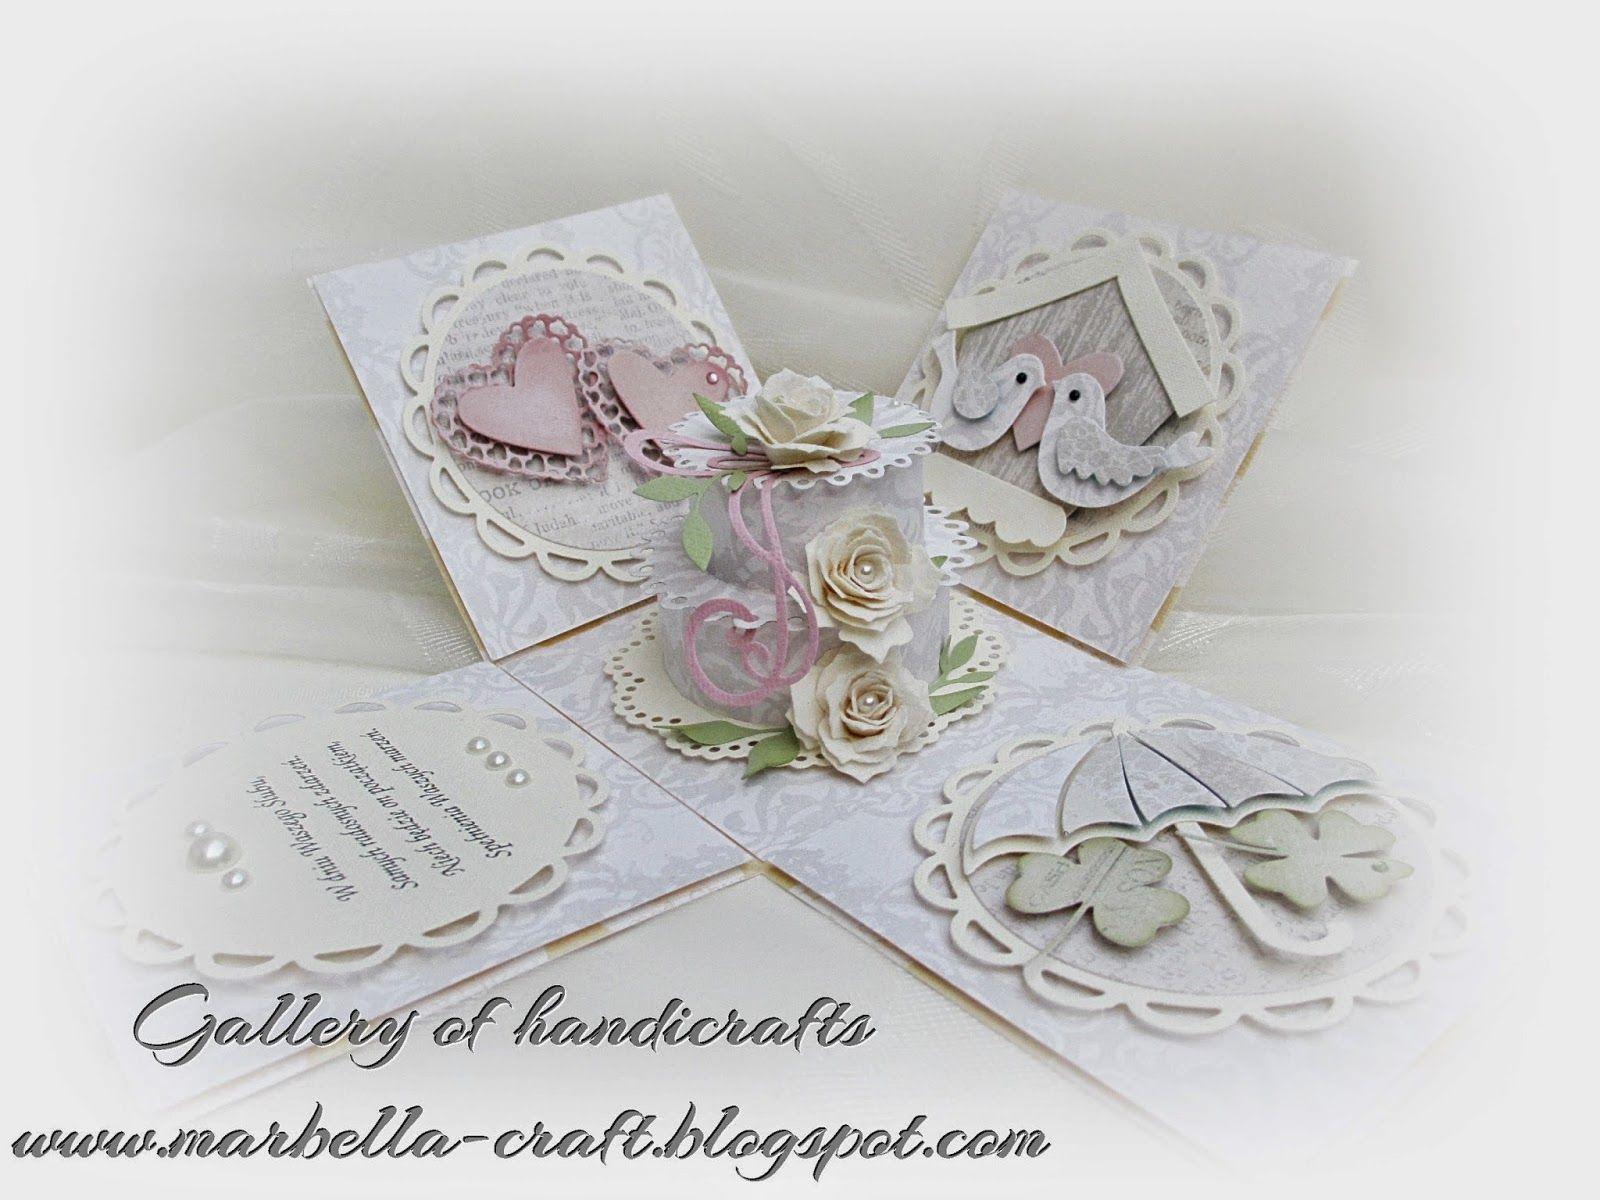 Gallery of handicrafts: newly weds - box